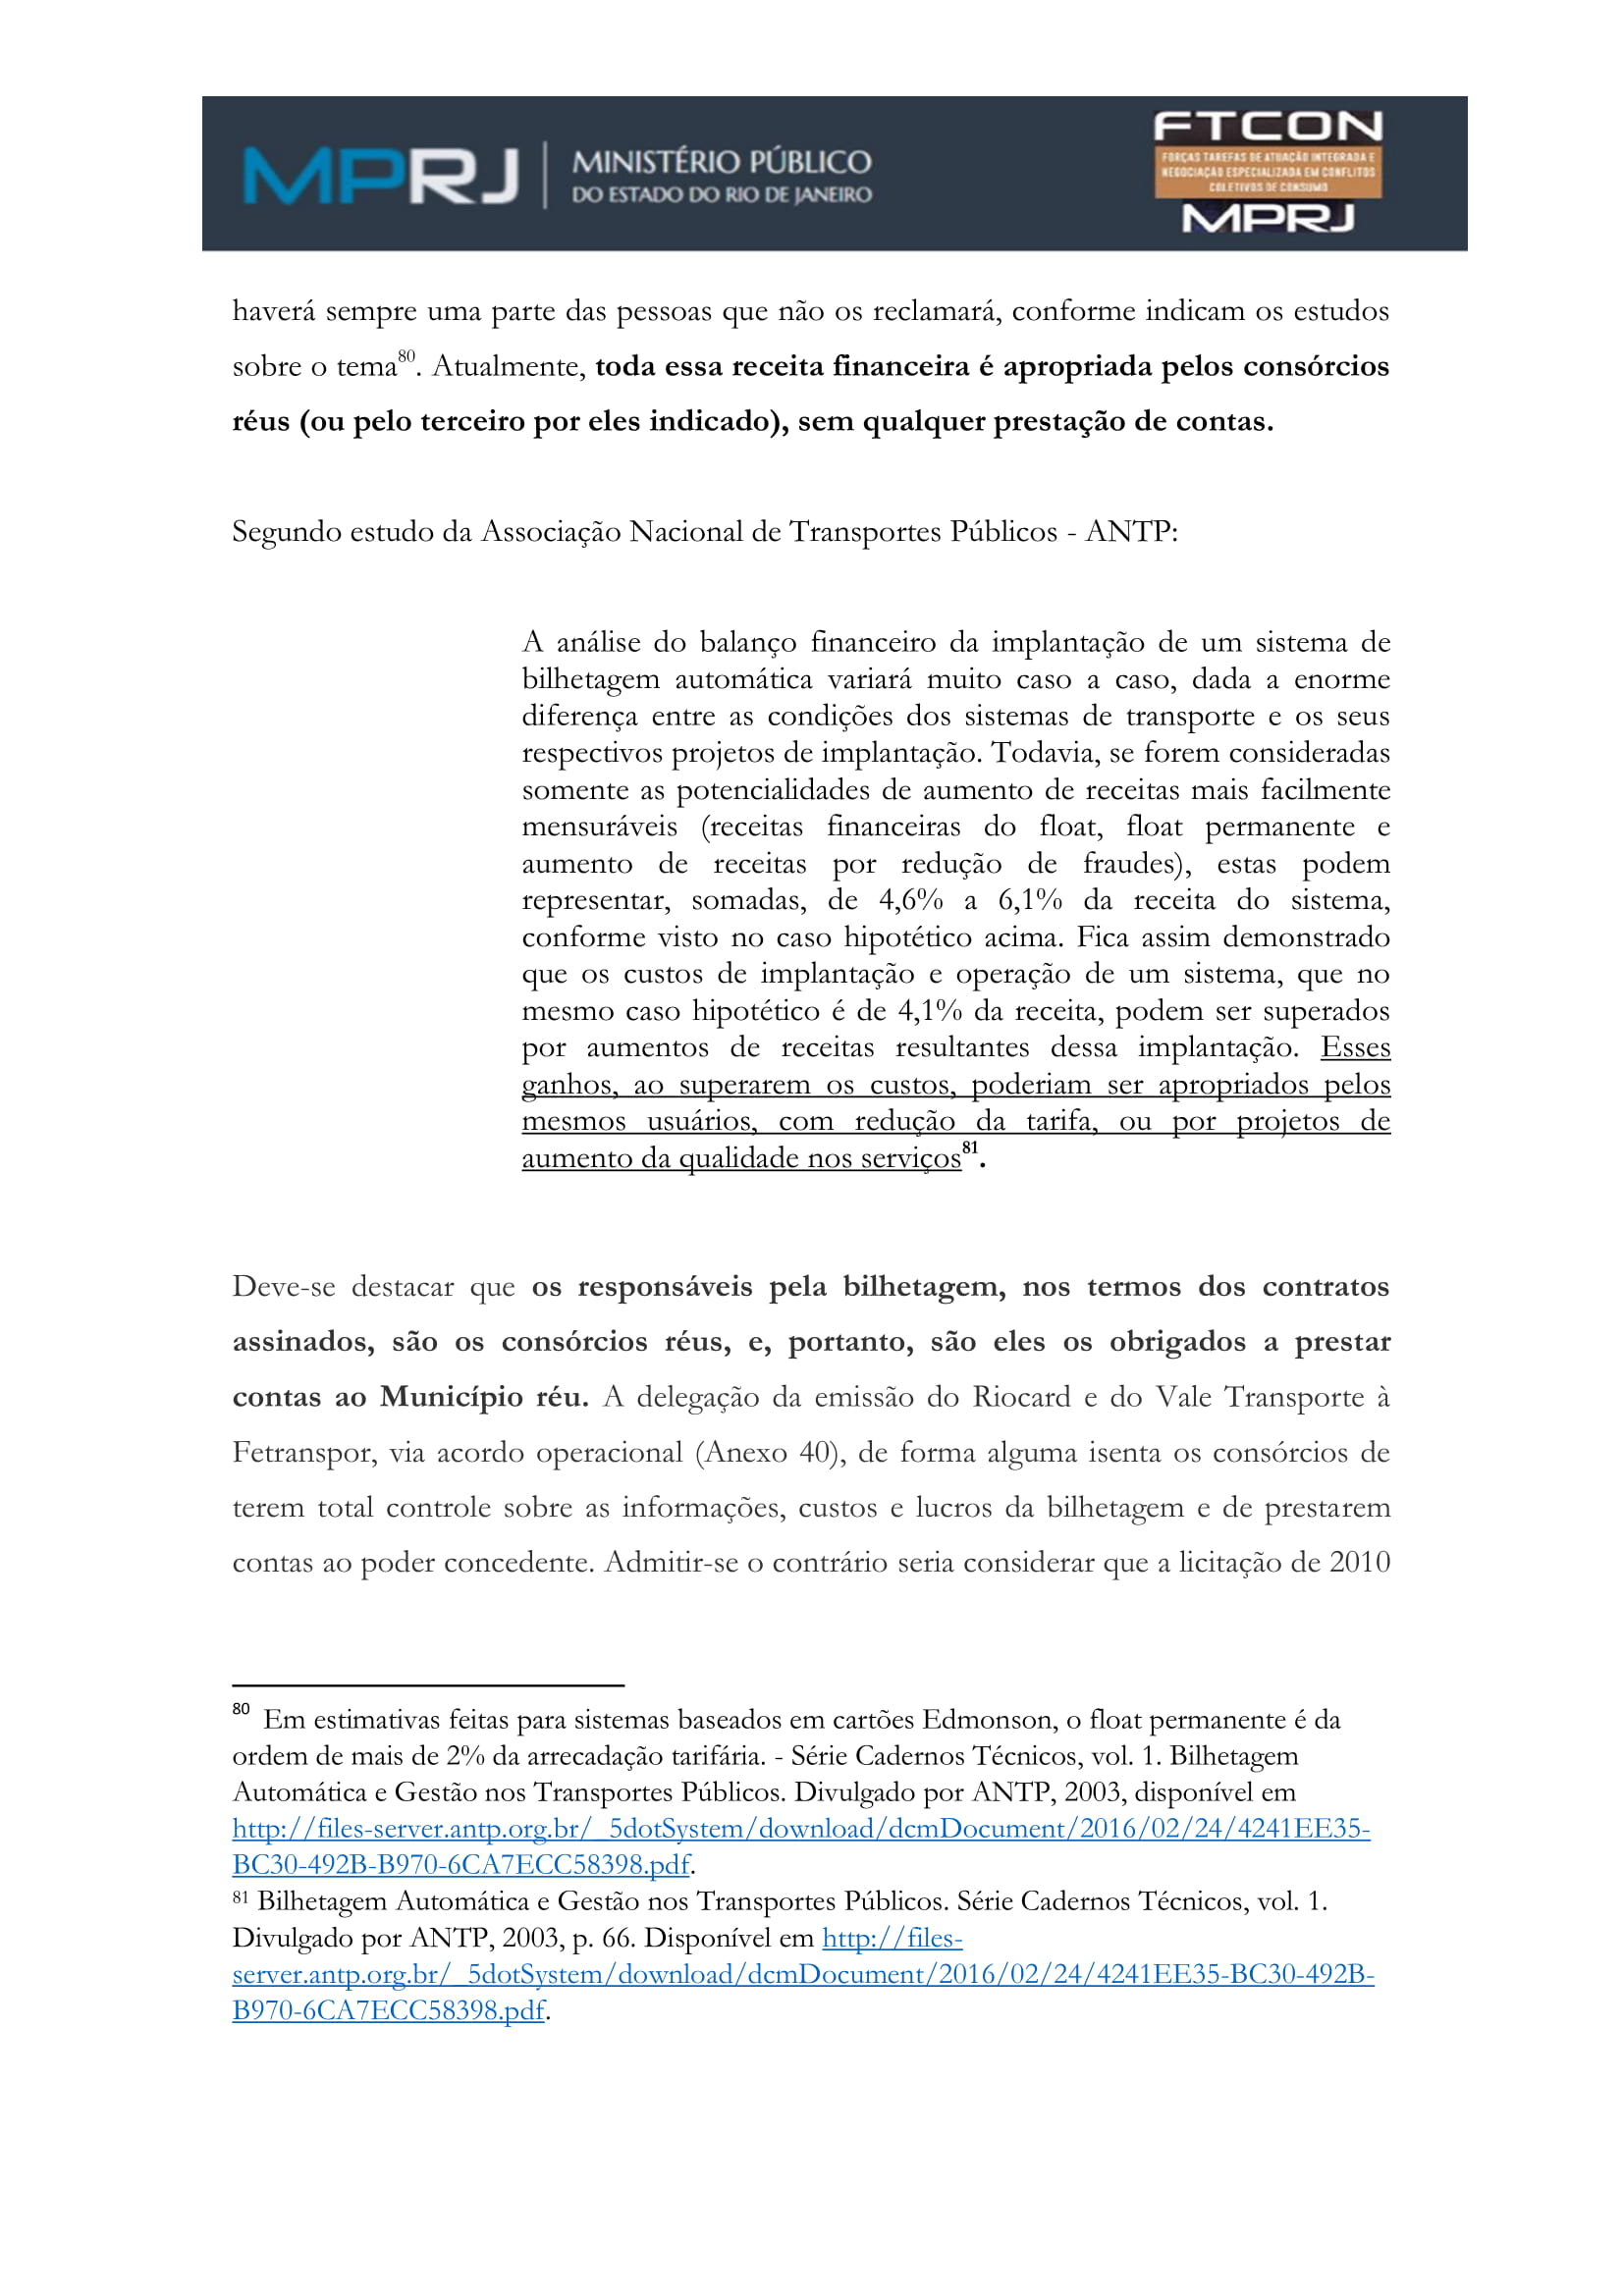 acp_caducidade_onibus_dr_rt-087